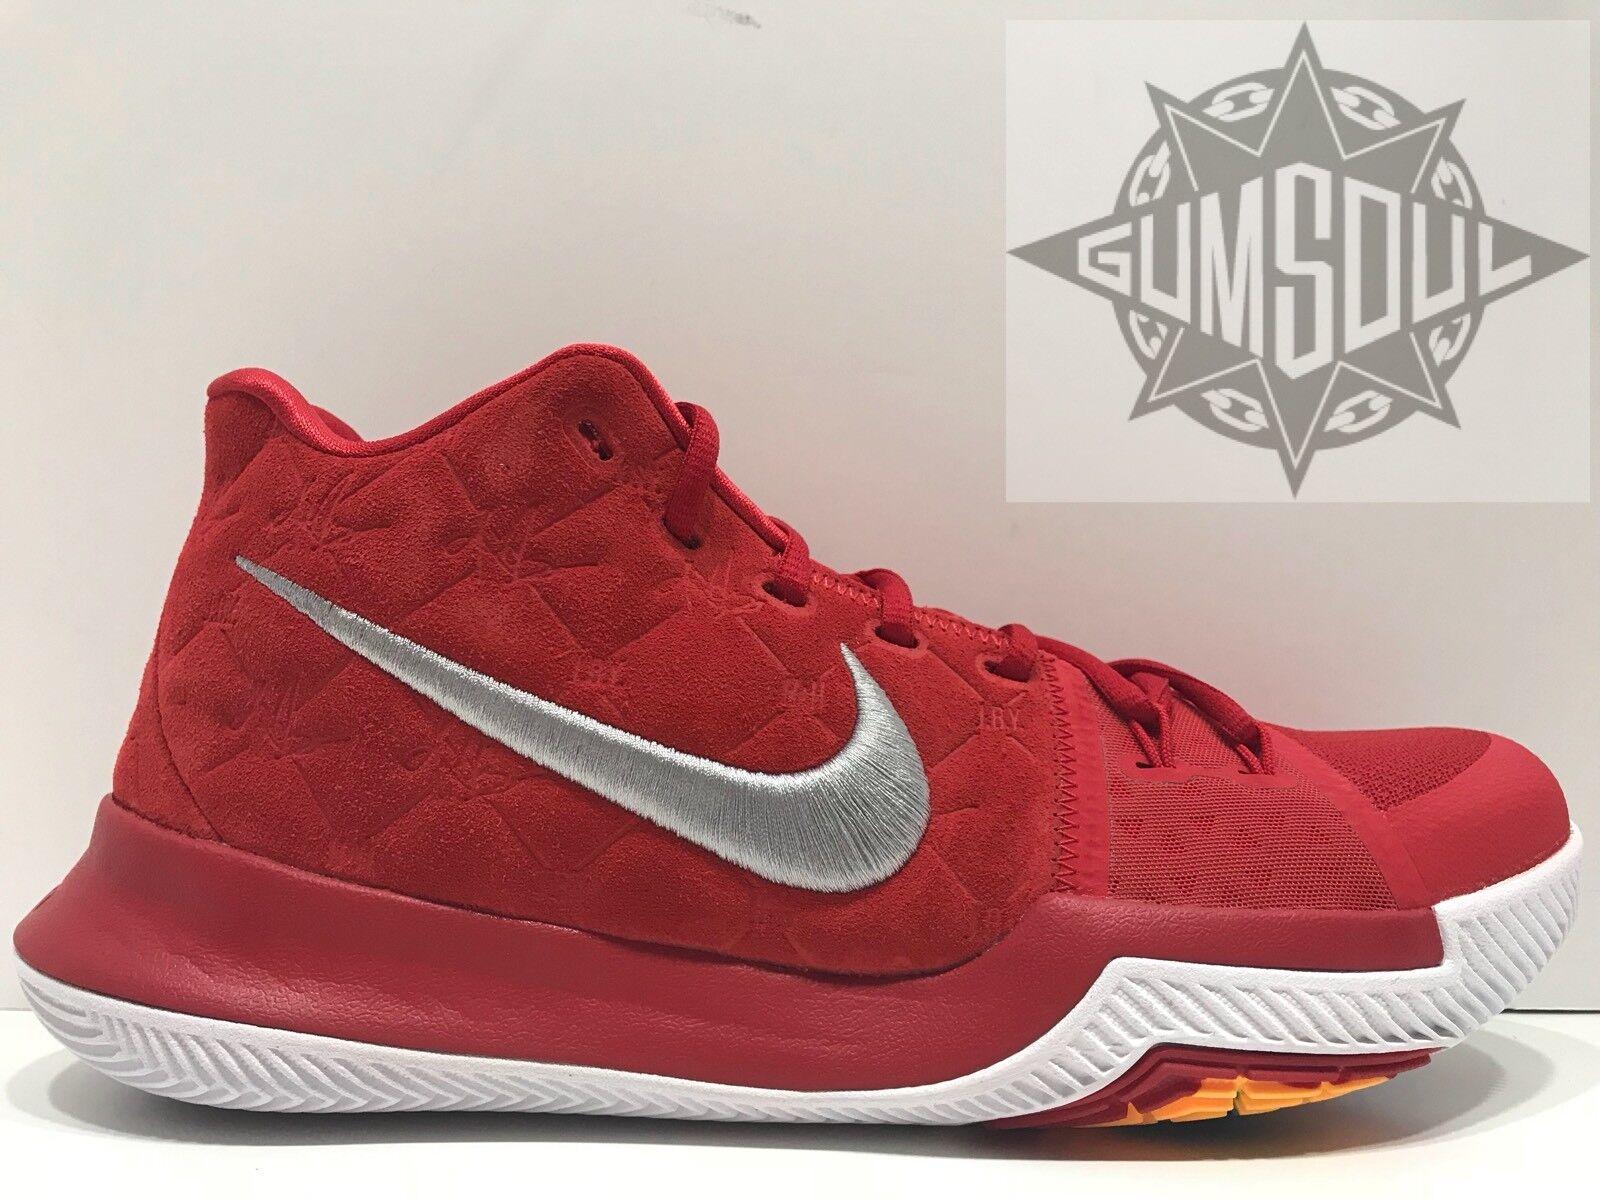 los angeles 828f8 e452c Nike kyrie 3 universit rosso - - - bianco - irving 852395 601 sz 10,